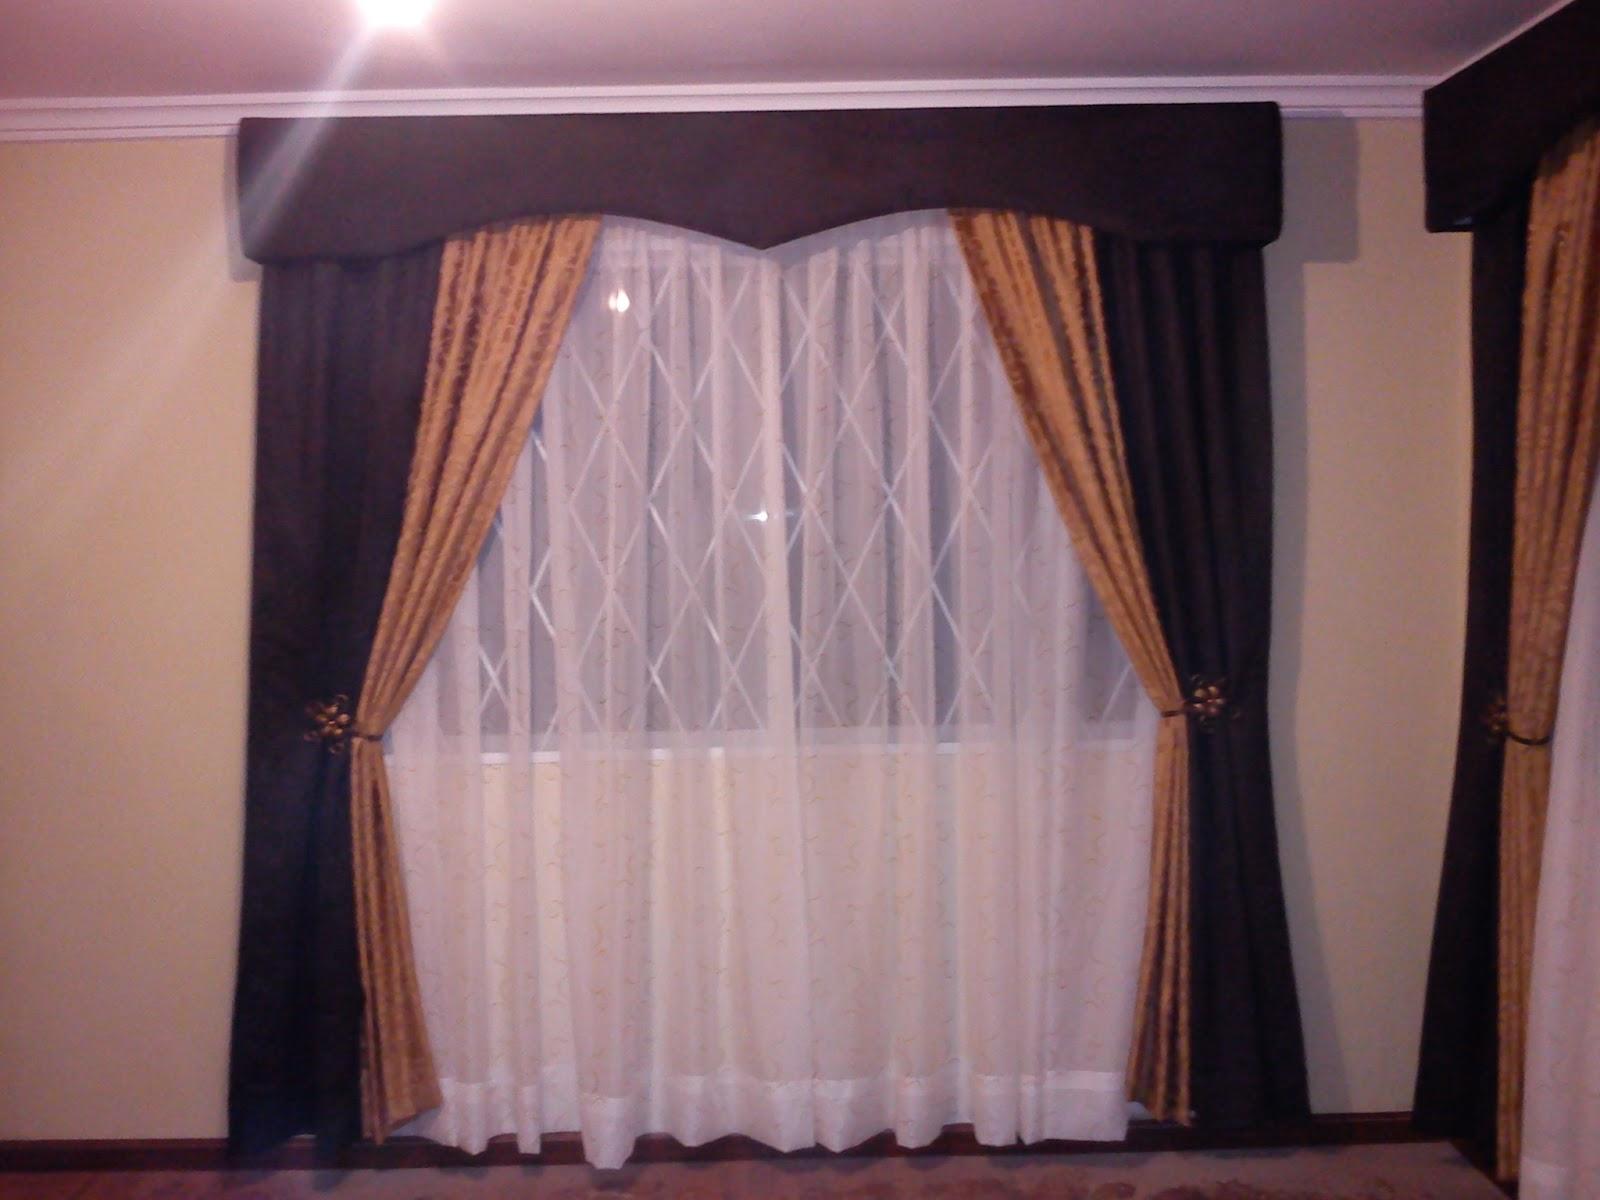 cortinova cat logo de cortinas para reas sociales